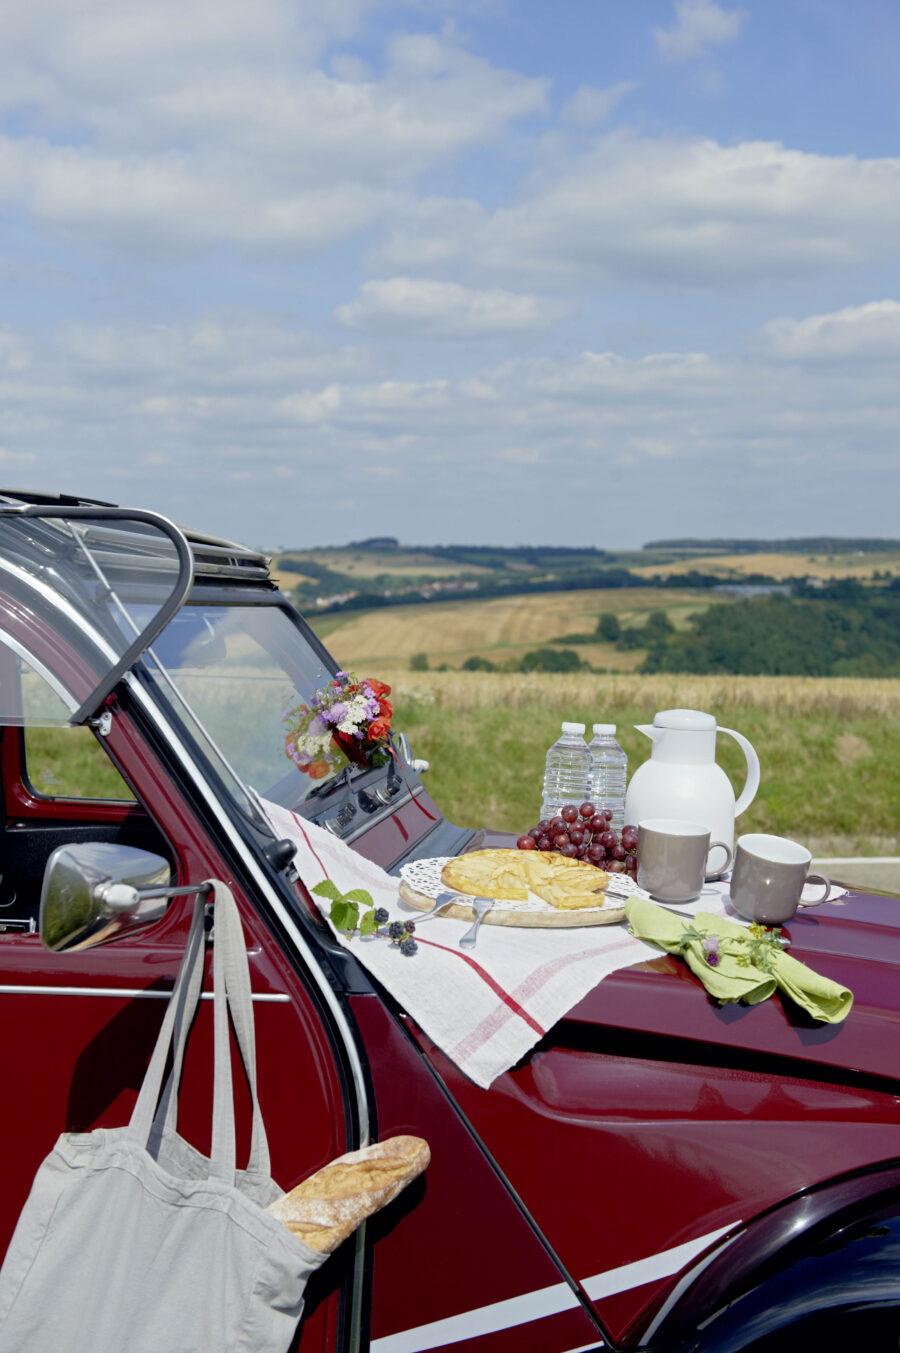 Ausflug nach Frankreich mit dem Oldtimer, Hotel Kloster Hornbach, Citroen2CV, Mietente, Picknickfahrt